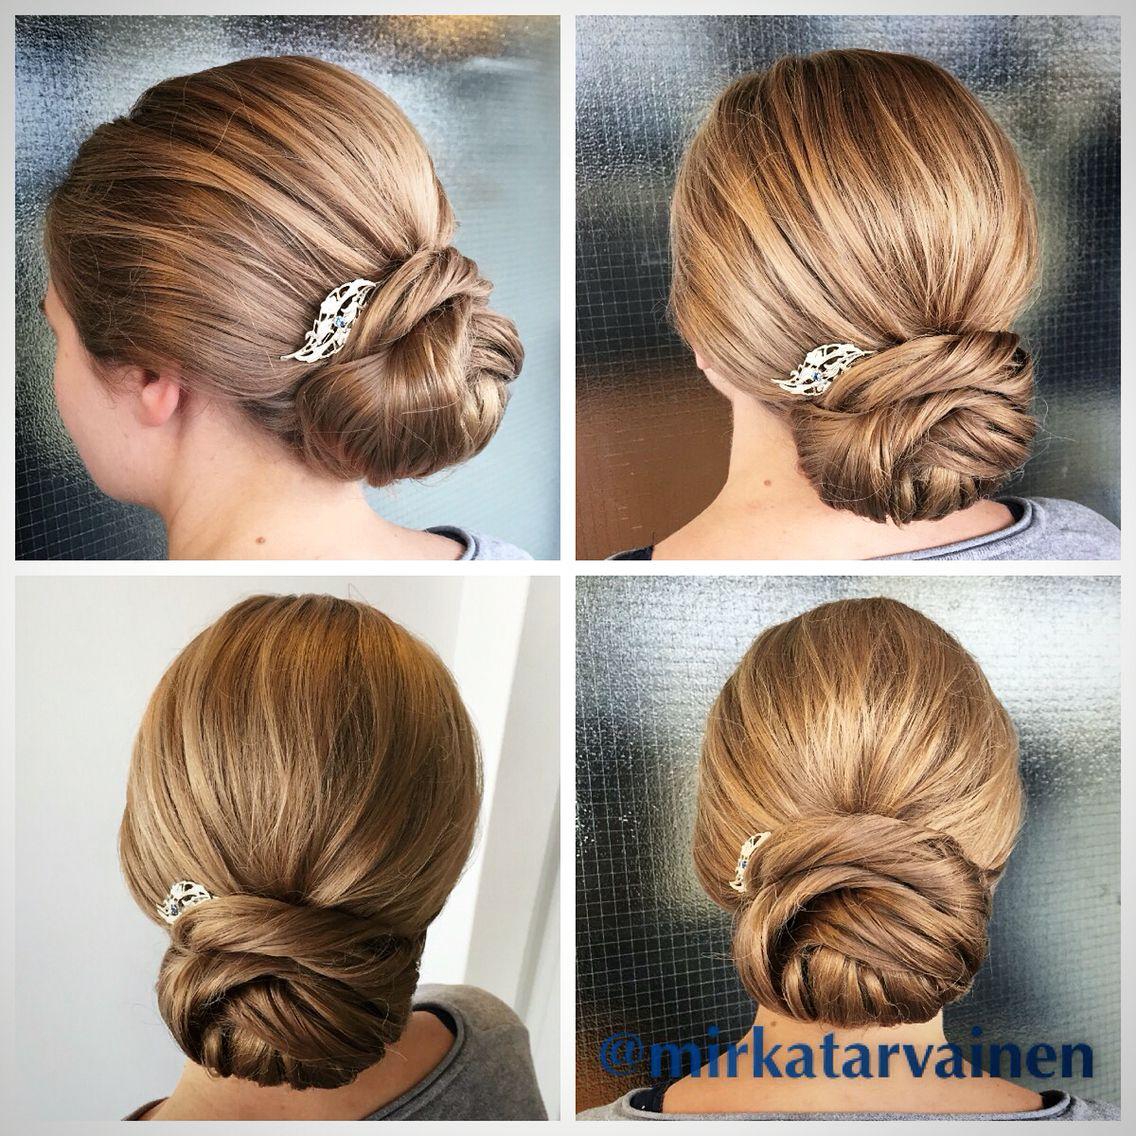 Morsiuskampaus - bridal hairstyle #nutturakampaus #hääkampaus #morsiuskampaus #bridalhair